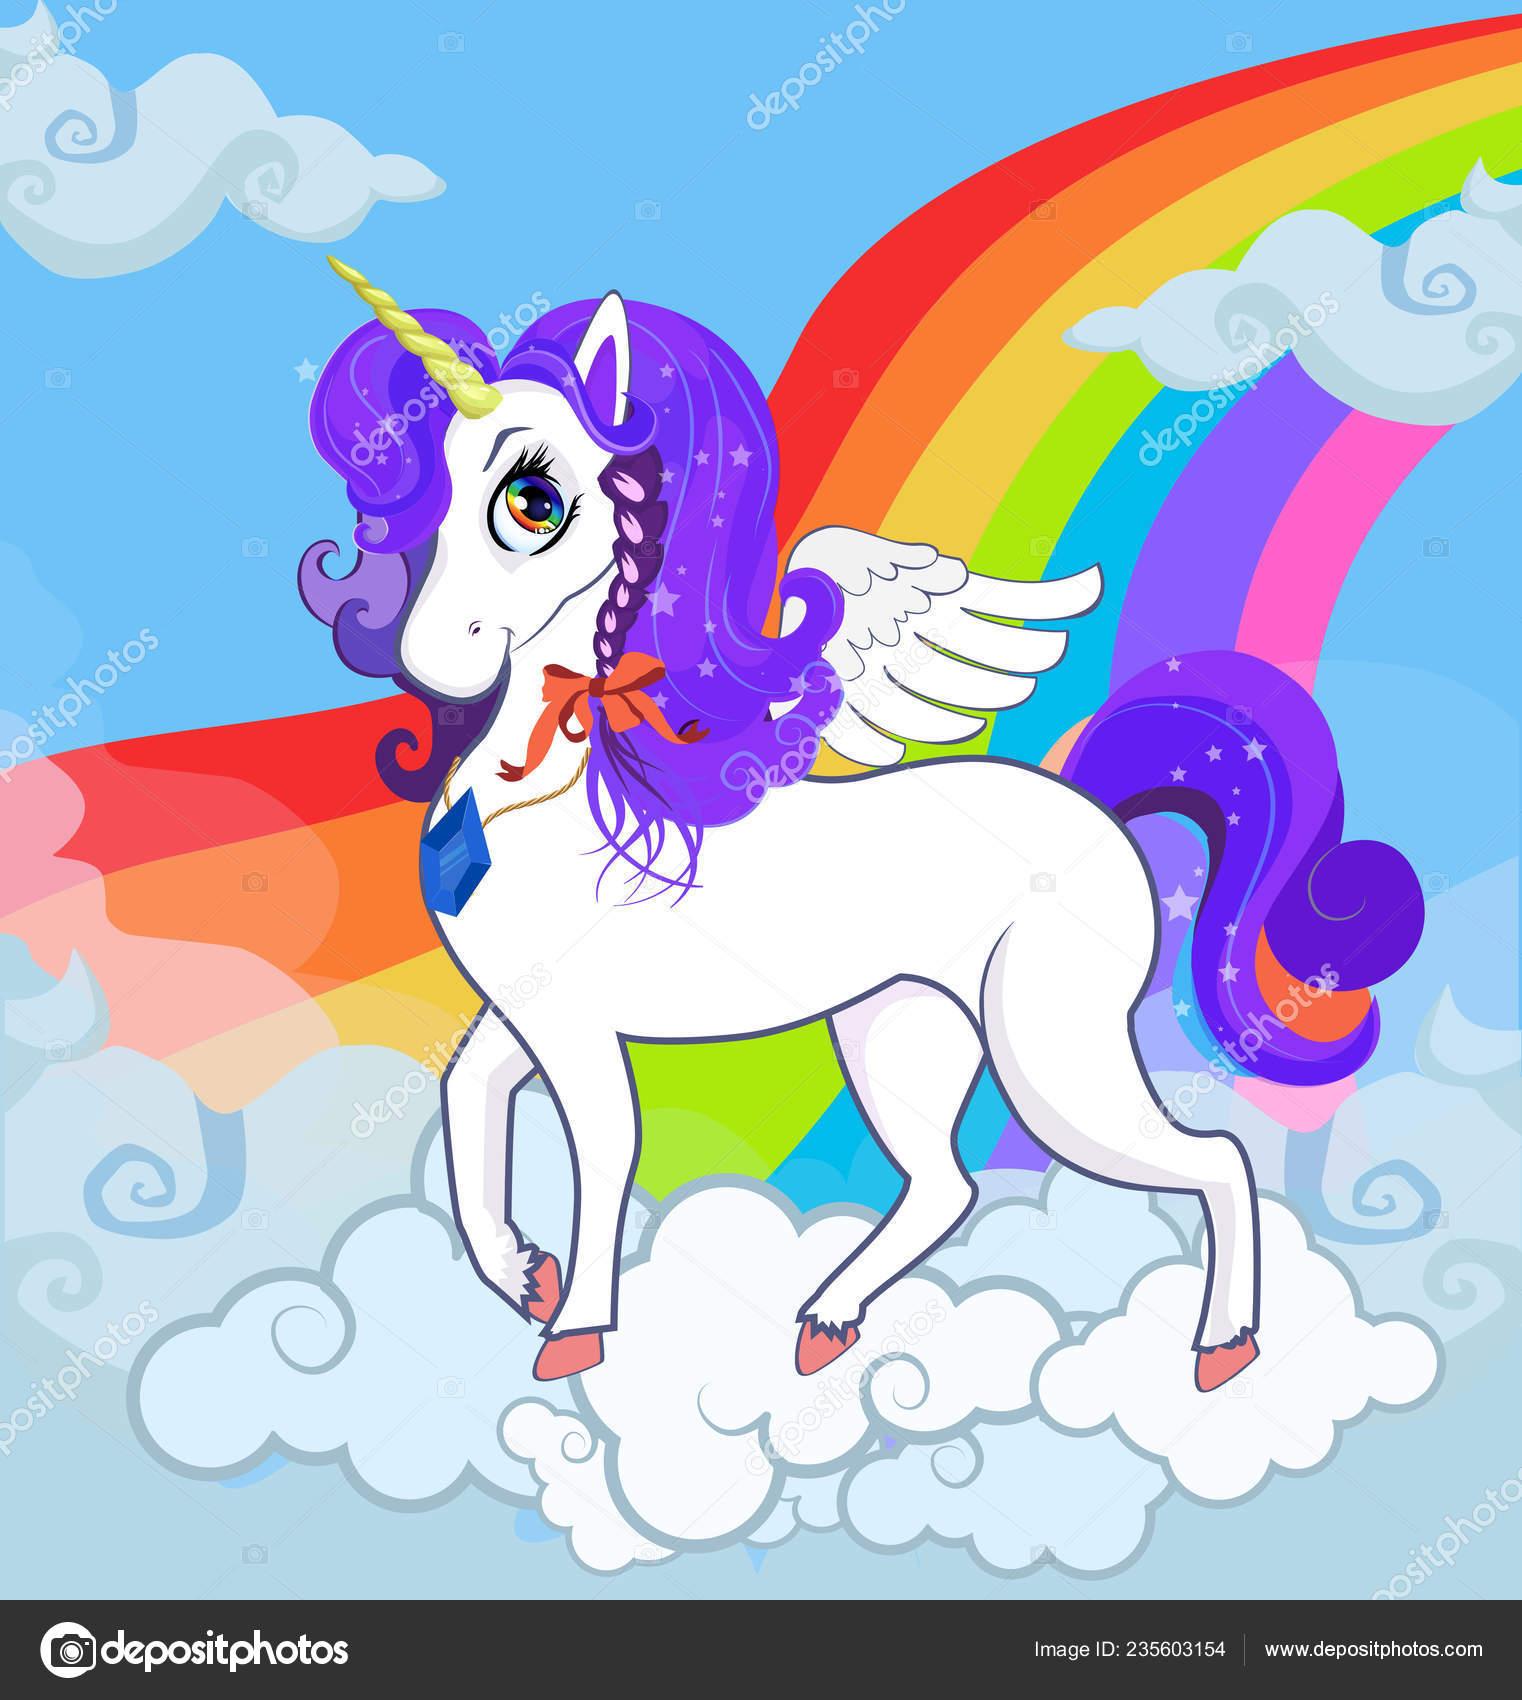 Multicolored Cartoon Kids Illustration White Pony Unicorn Princess